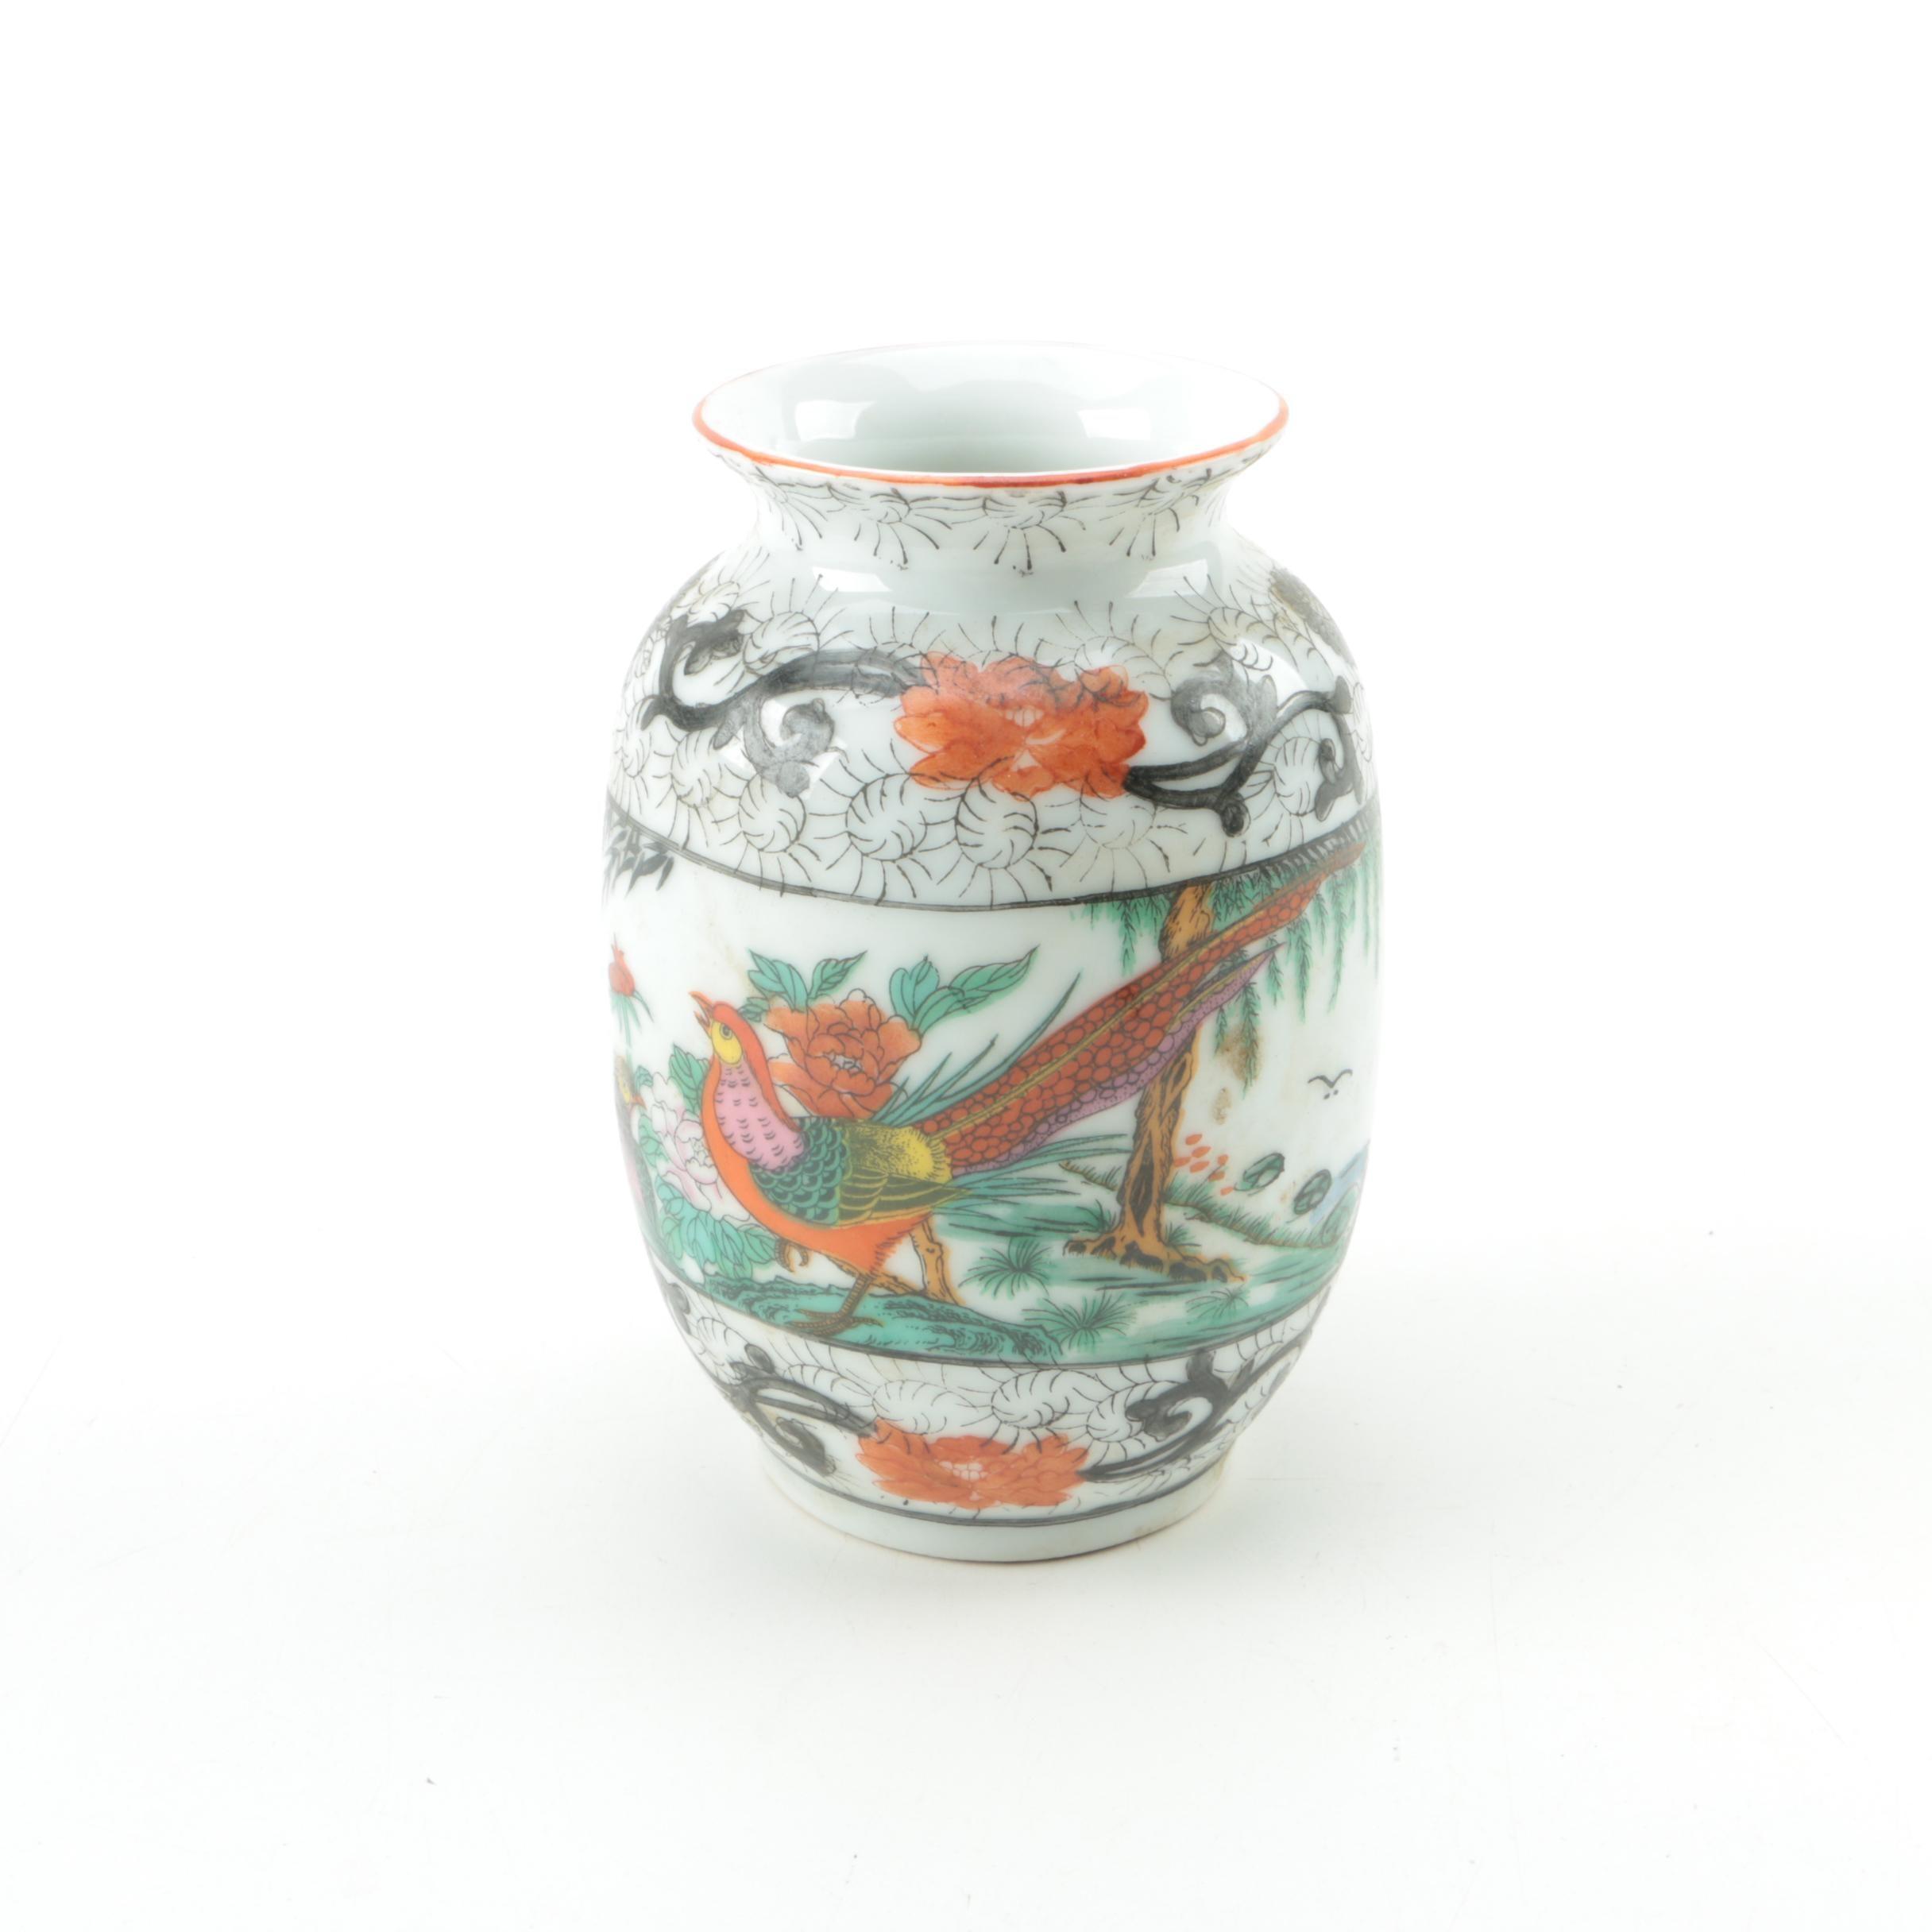 Porcelain Hand-Painted Chinese Pheasant Vase